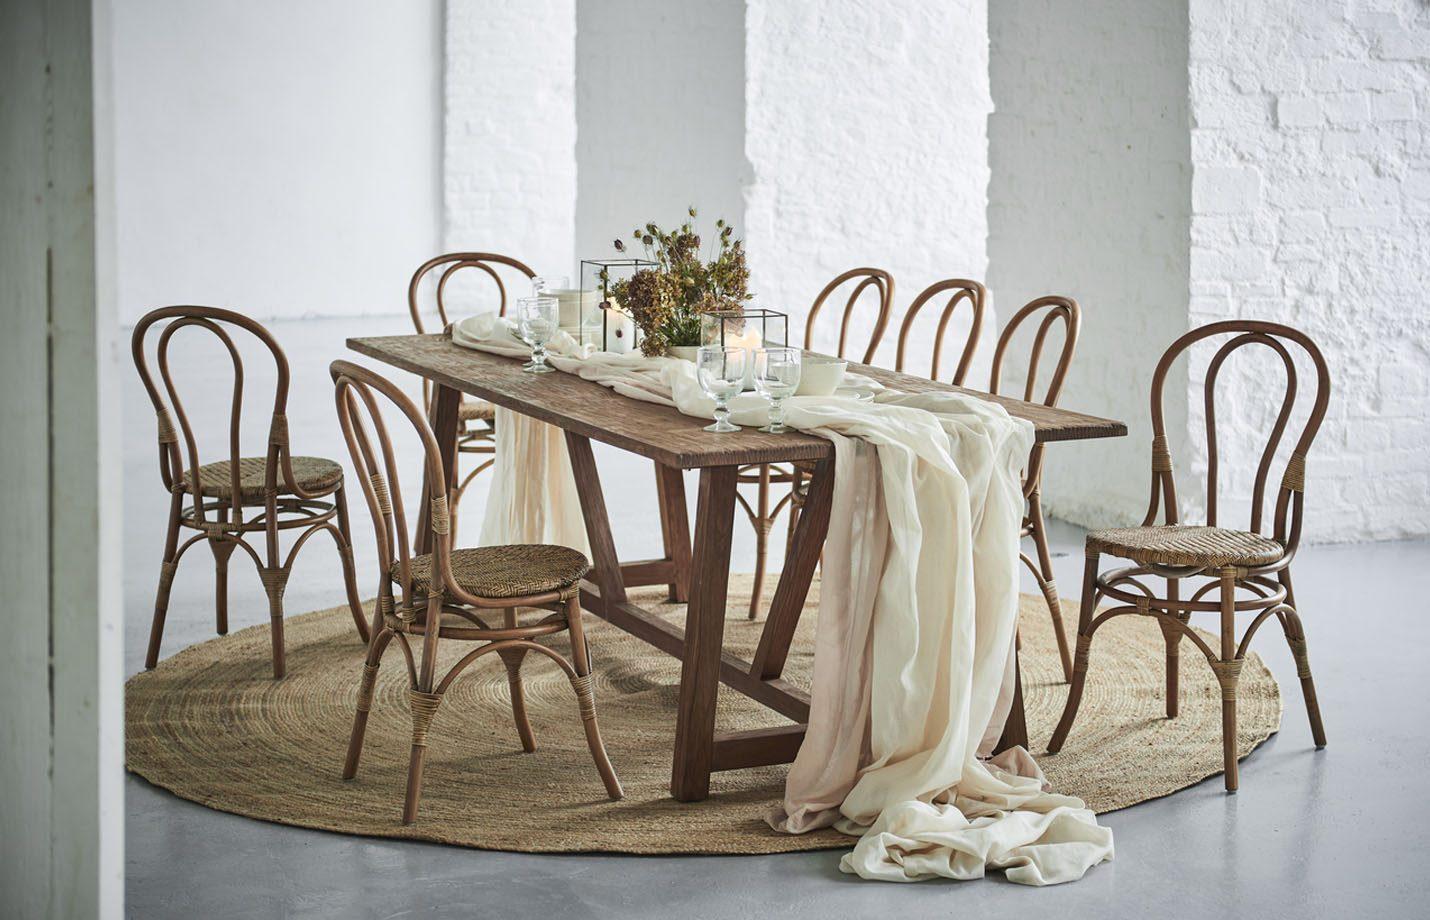 Bent-Rattan-Bistro-Chair-by-fabiia-LS01